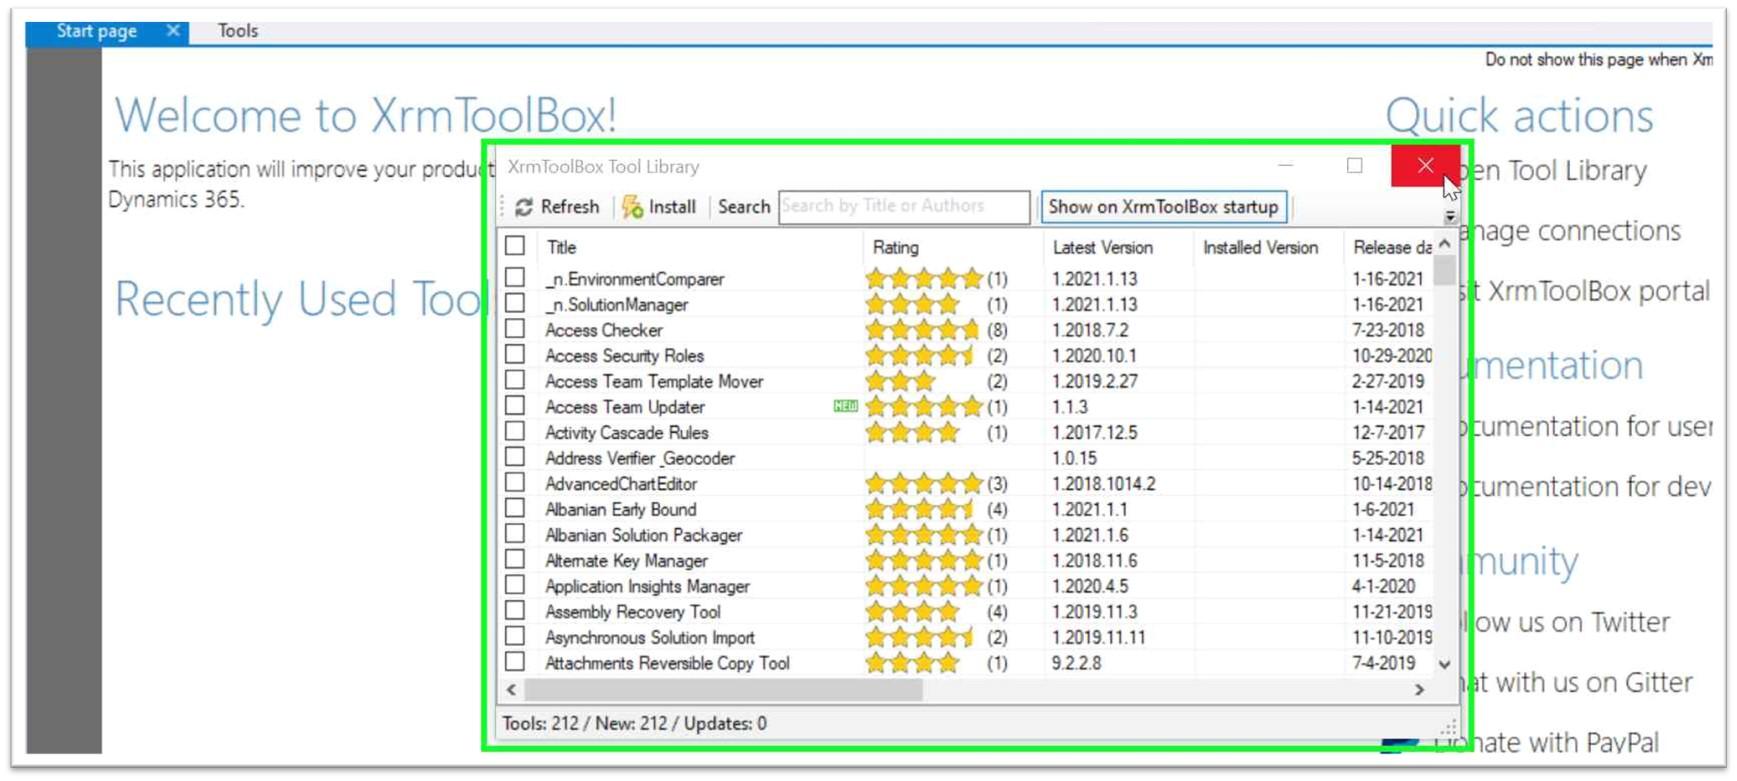 XrmToolBox-tool-Library